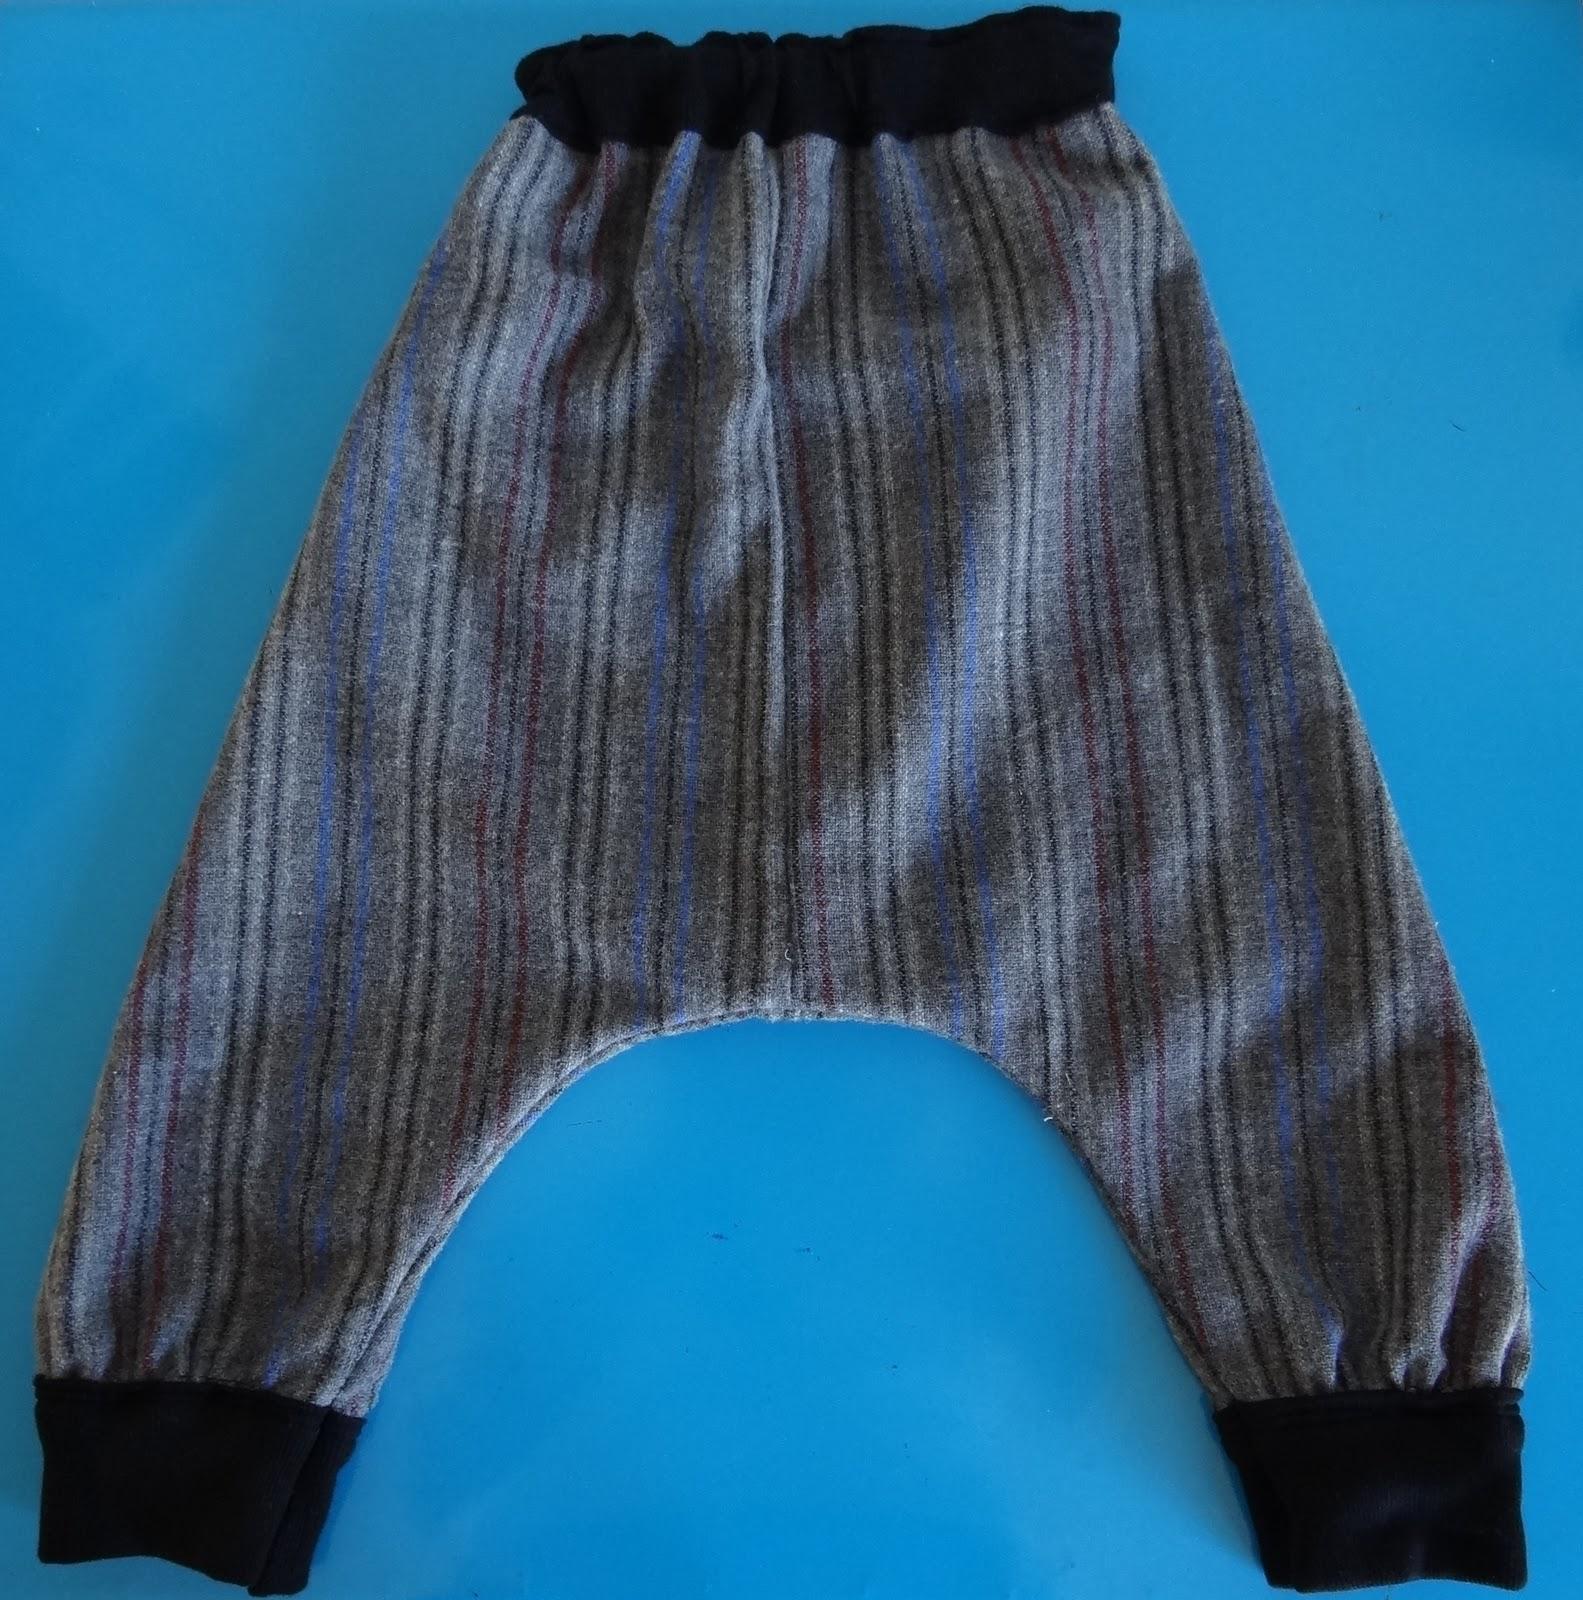 Pantalon Camiseta Bombacho Costura Del Y Naii Buho Patronaje 4R3AL5jq